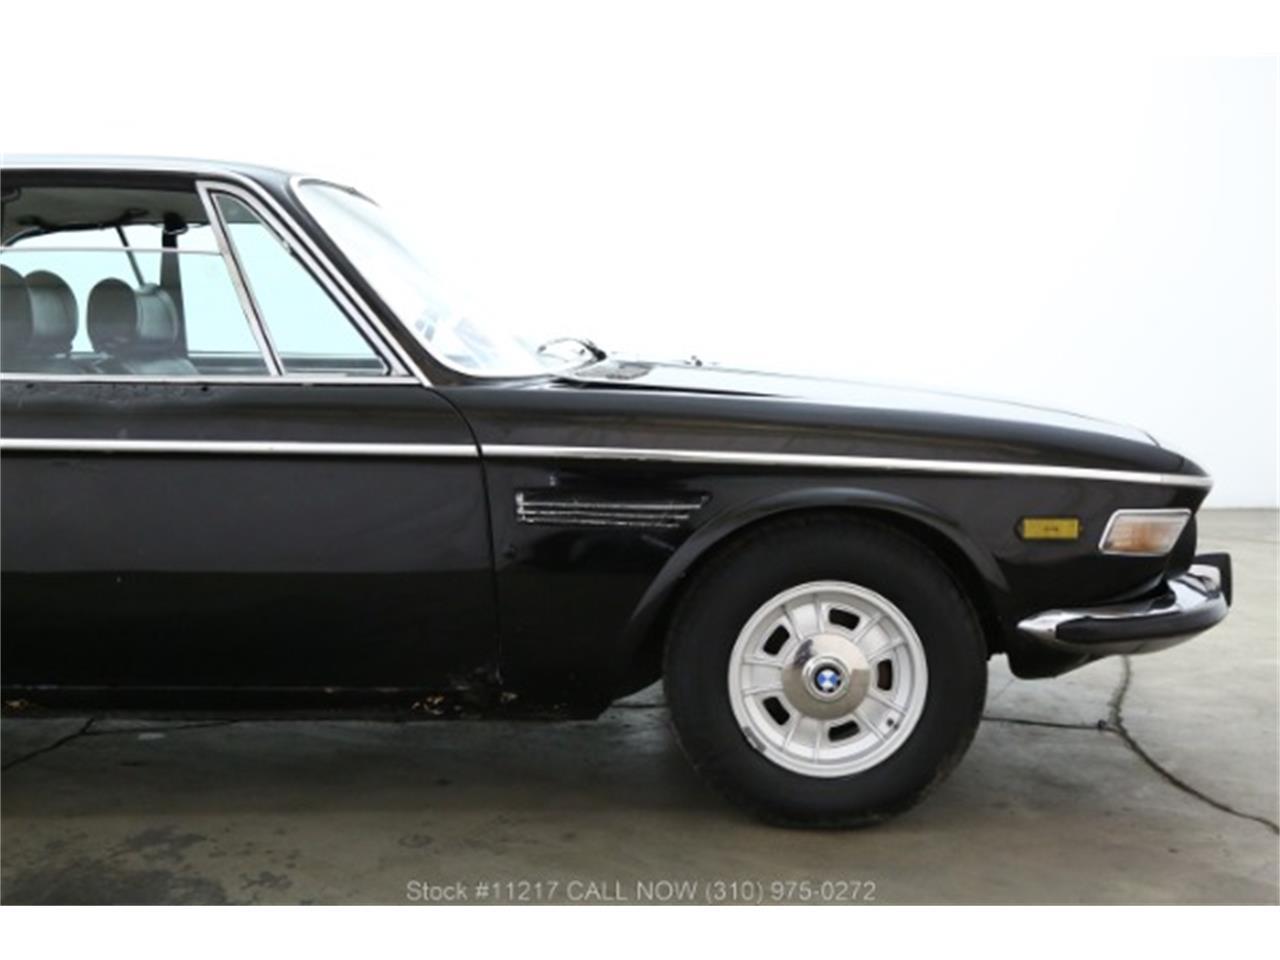 Large Picture of Classic '72 BMW 3.0CSL located in California - $16,750.00 - QTUV